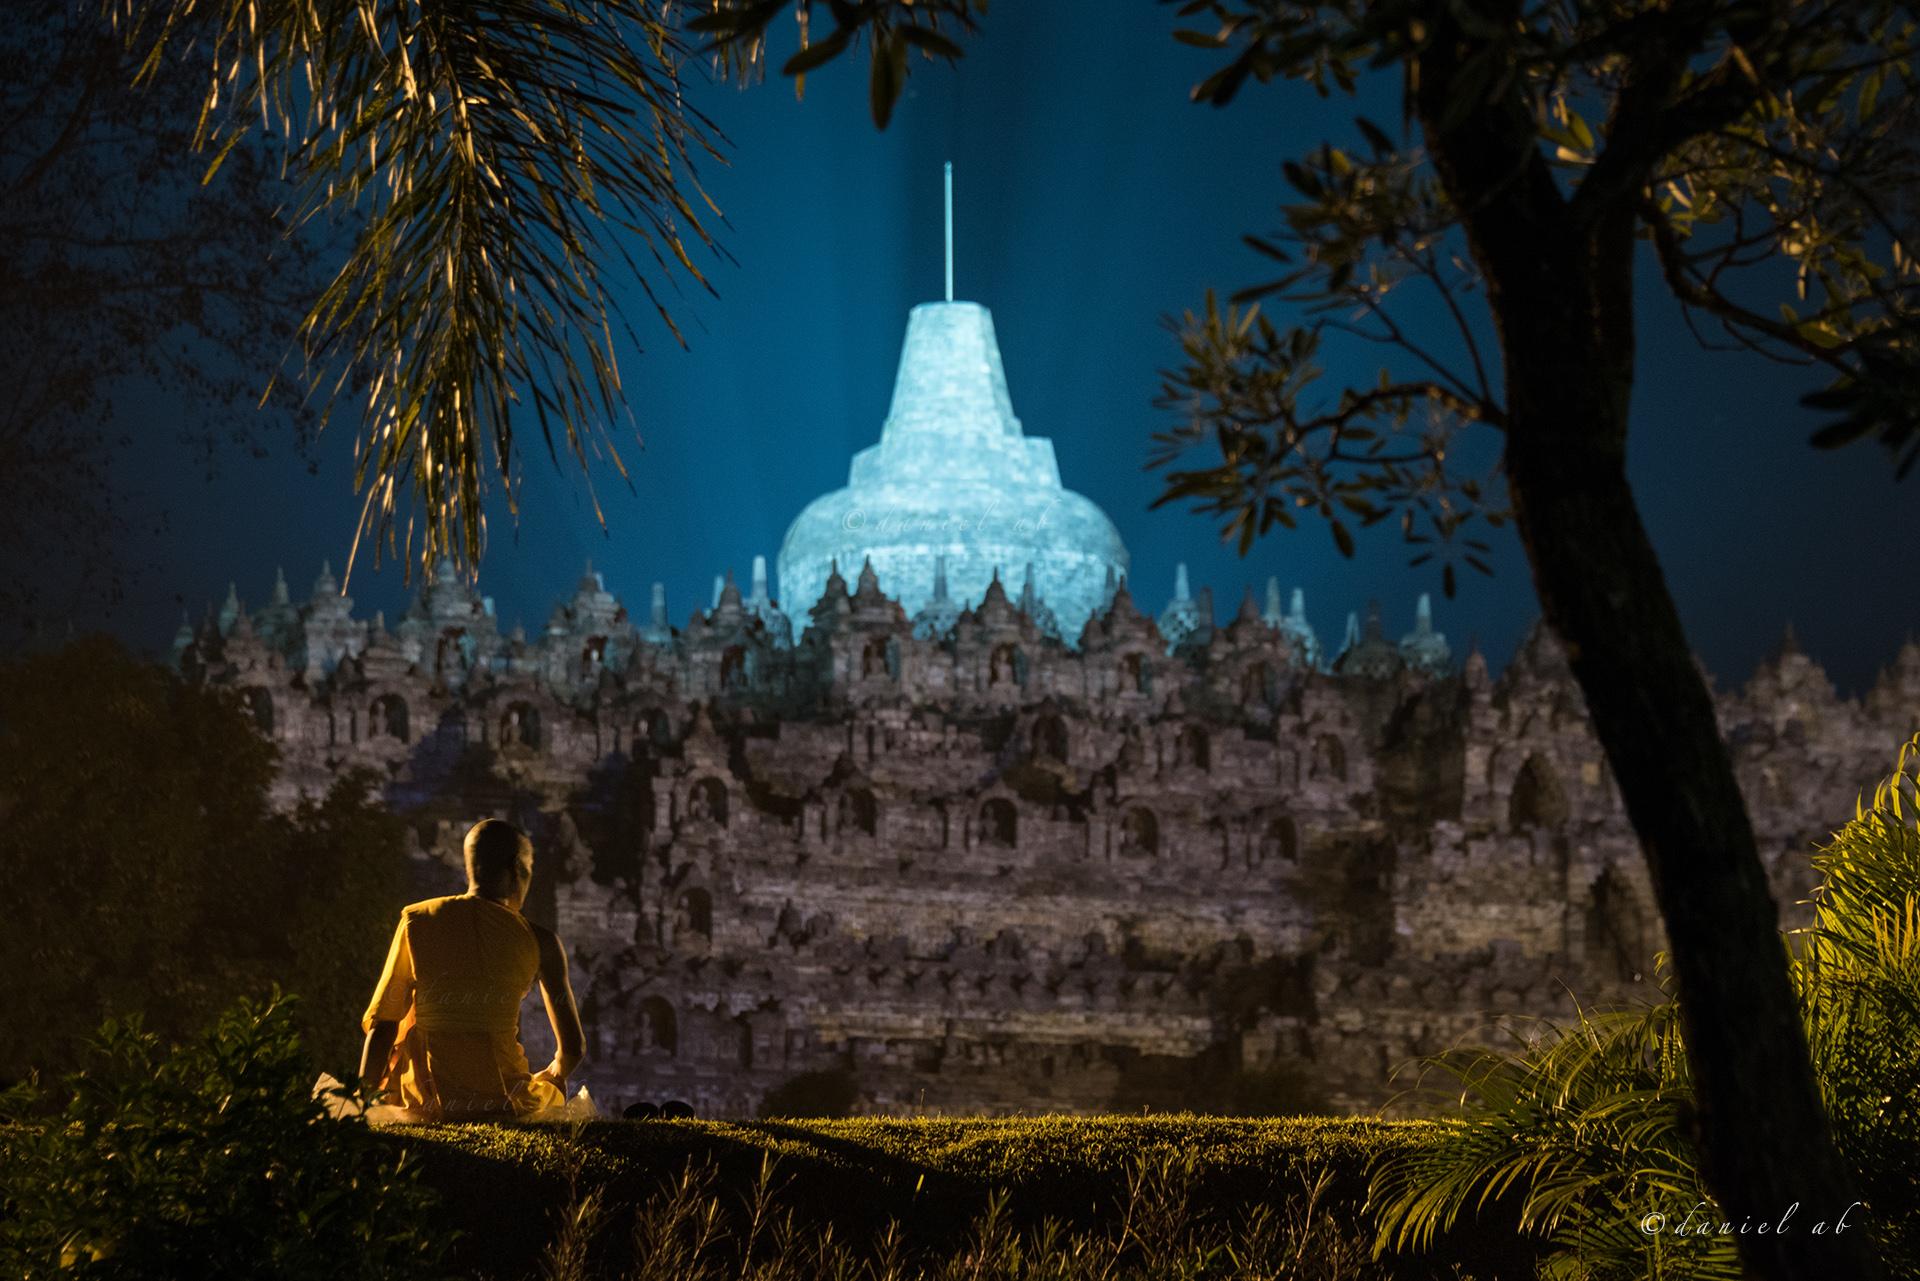 Indonesia Temple Buddha Buddhist Monk Buddhism Jogjakarta Borobudur Vesak Waisak